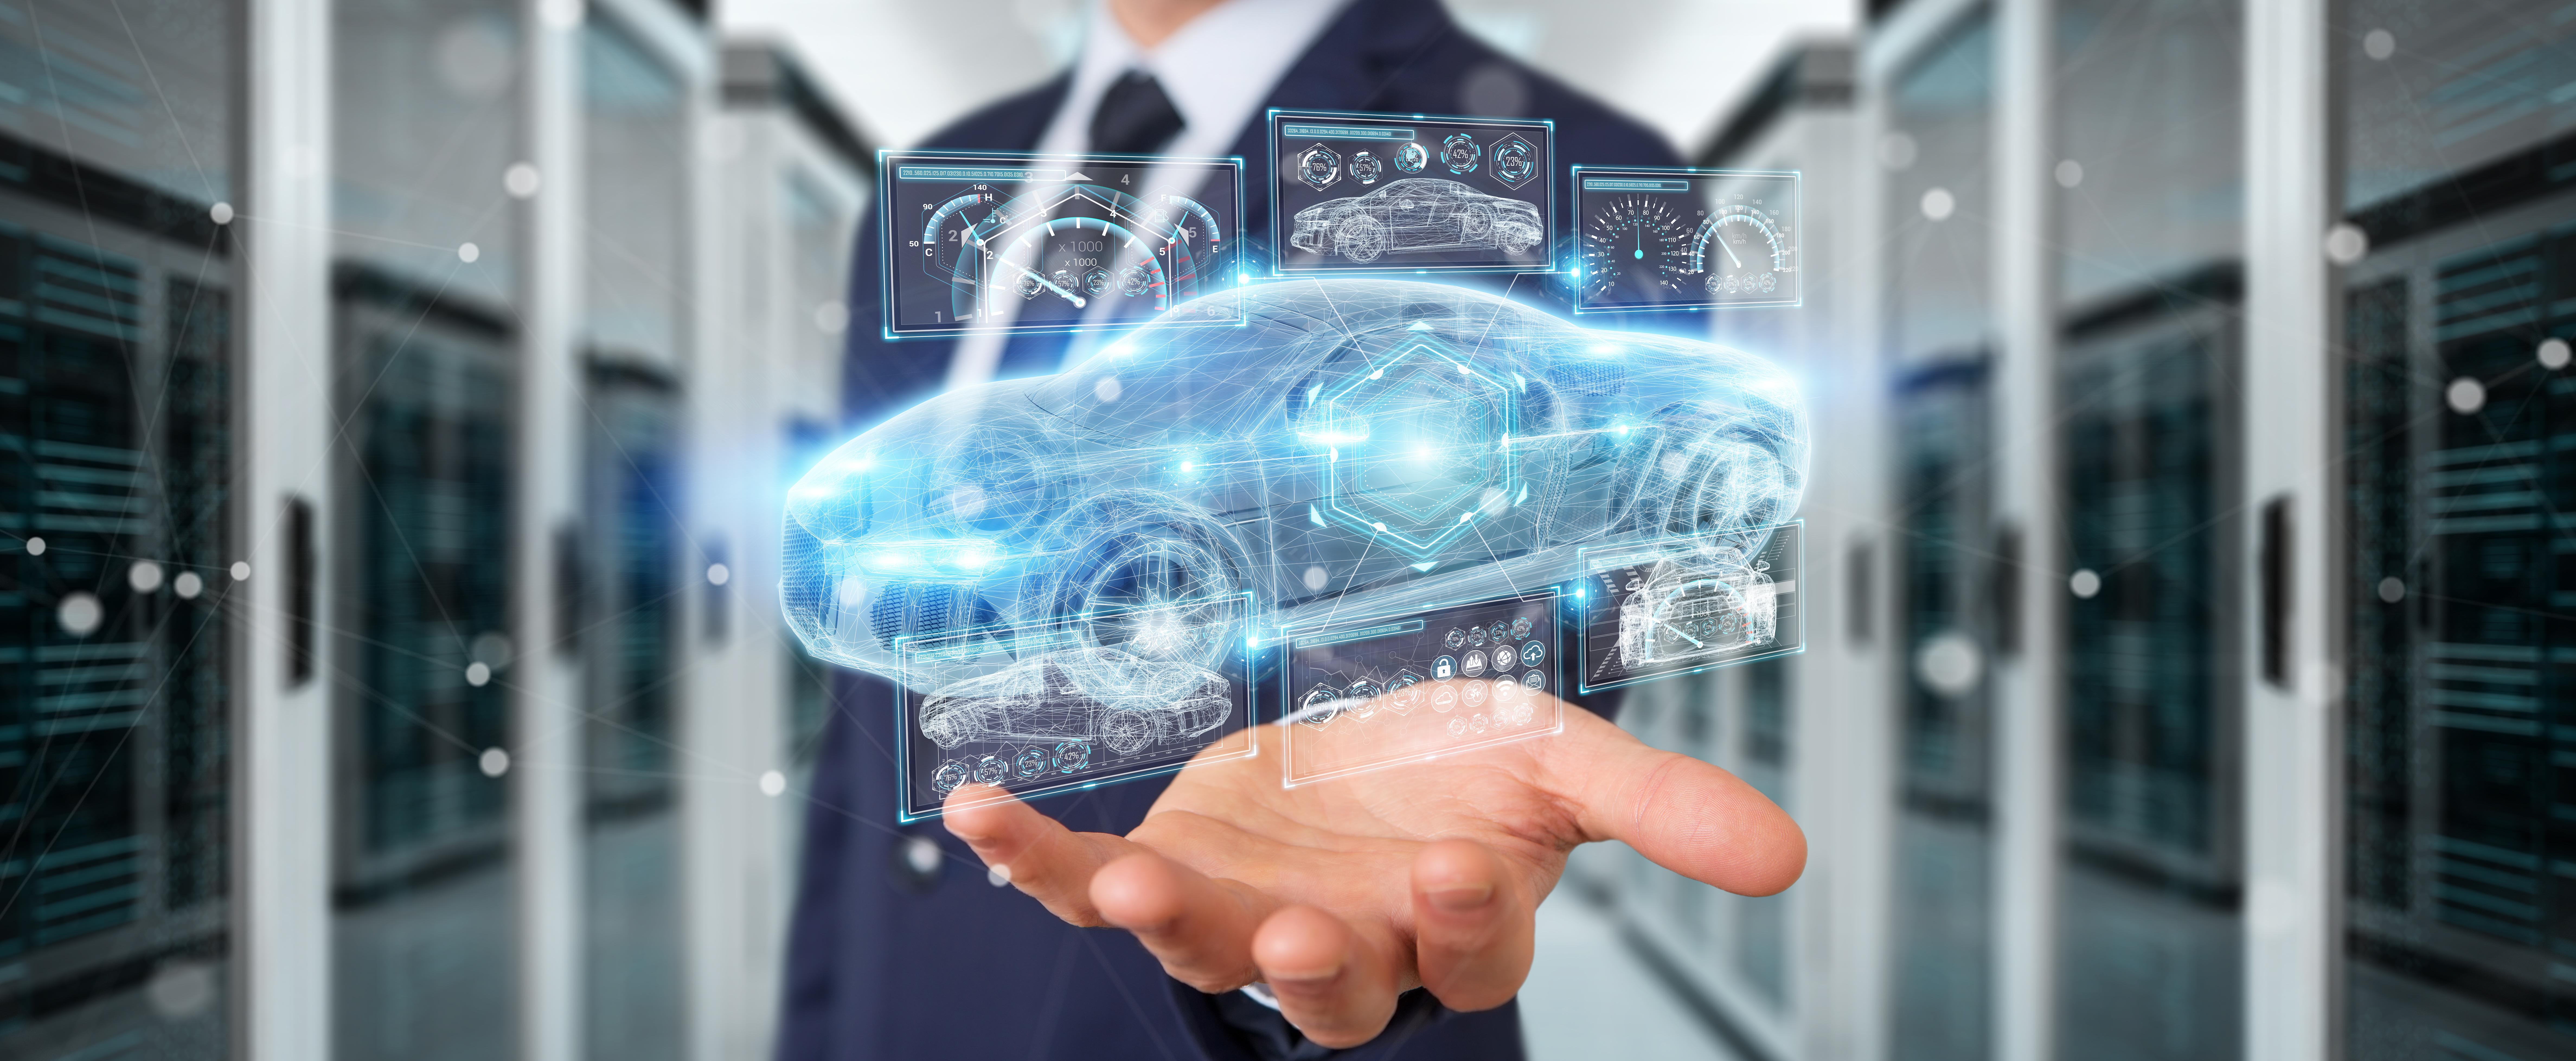 IOTA AND VW TO BUILD AUTONOMOUS SYSTEM CARS 2